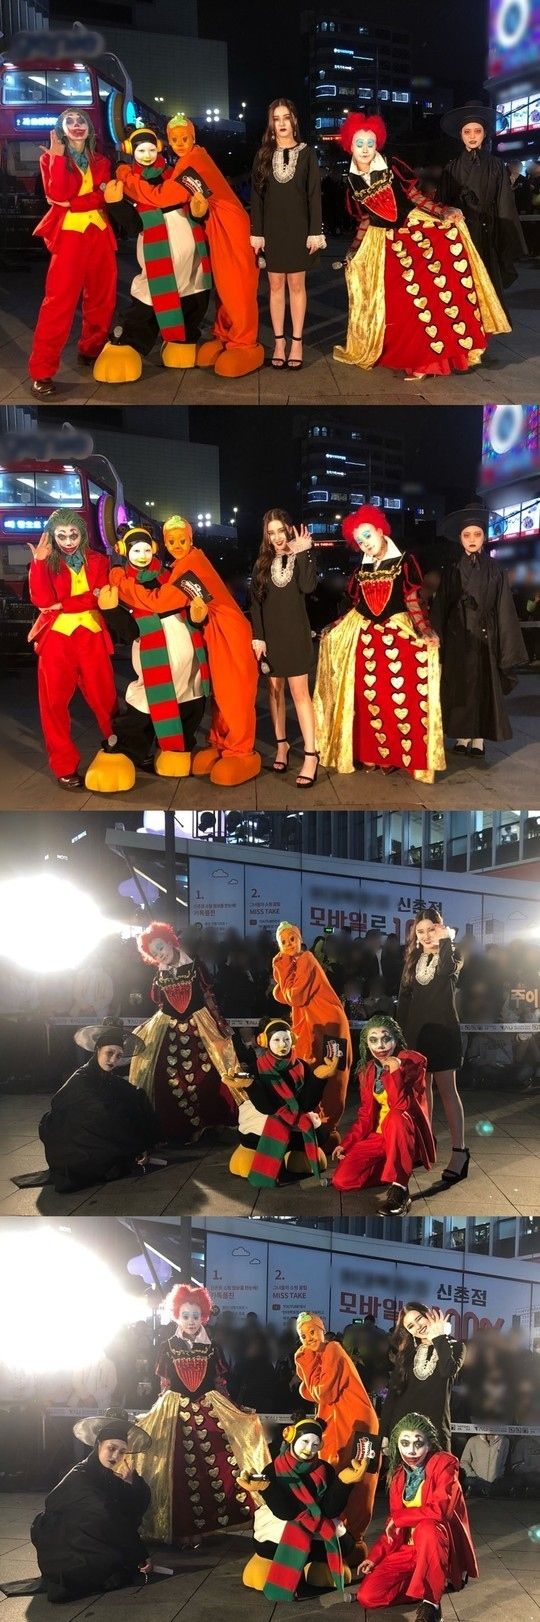 MOMOLAND万圣节惊喜 路上开演唱会500多名粉丝欢呼